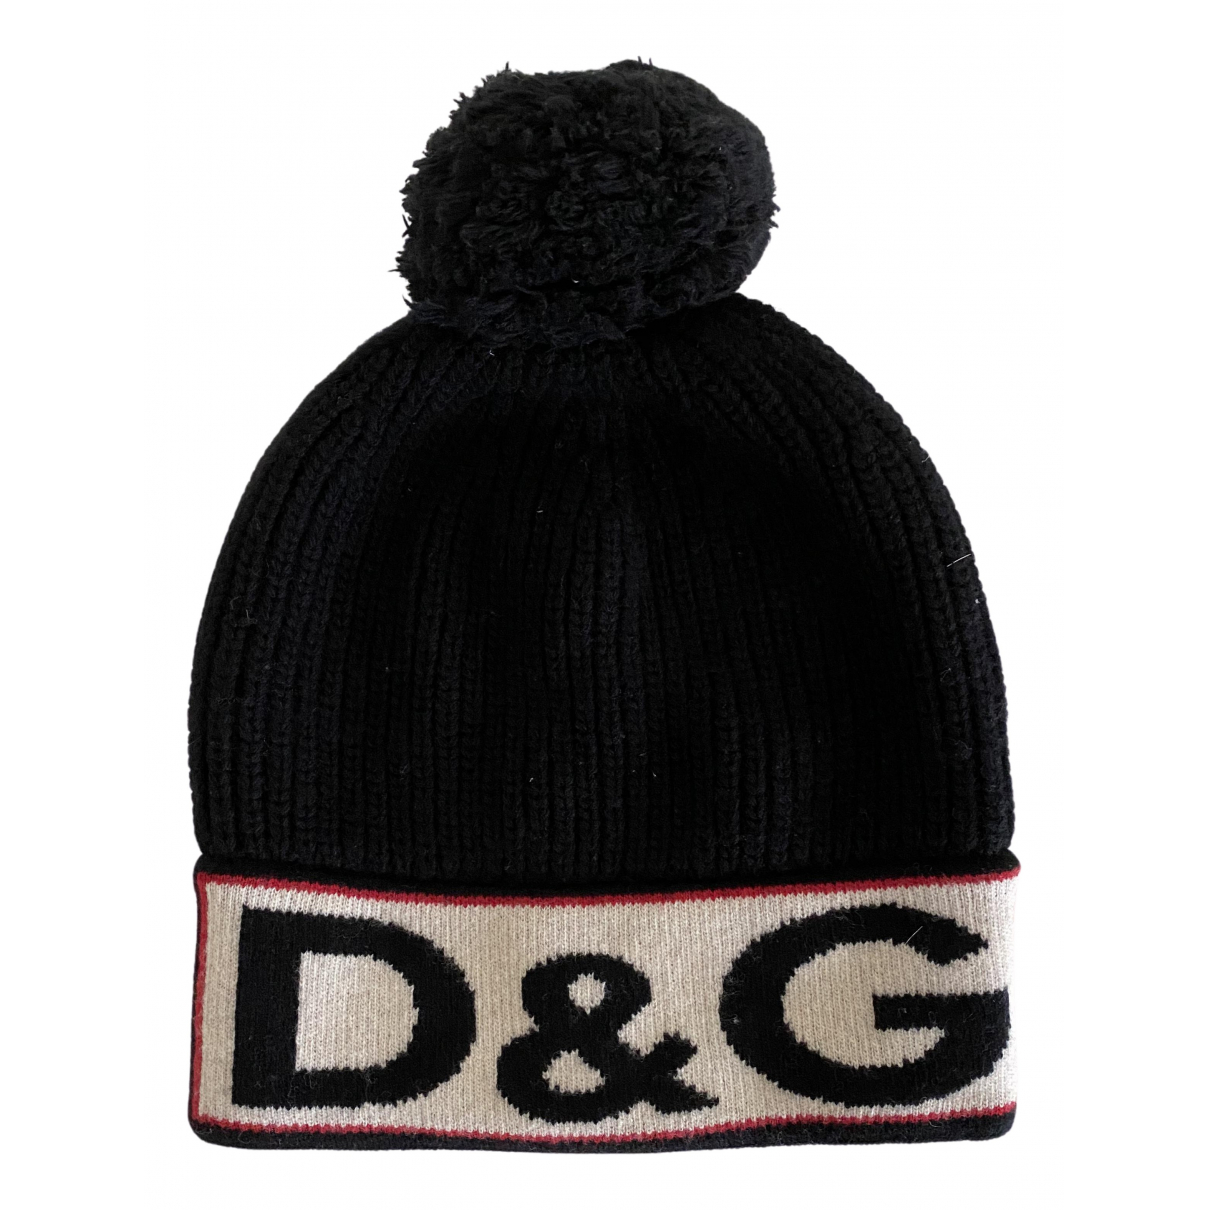 Dolce & Gabbana N Black Wool hat for Women M International